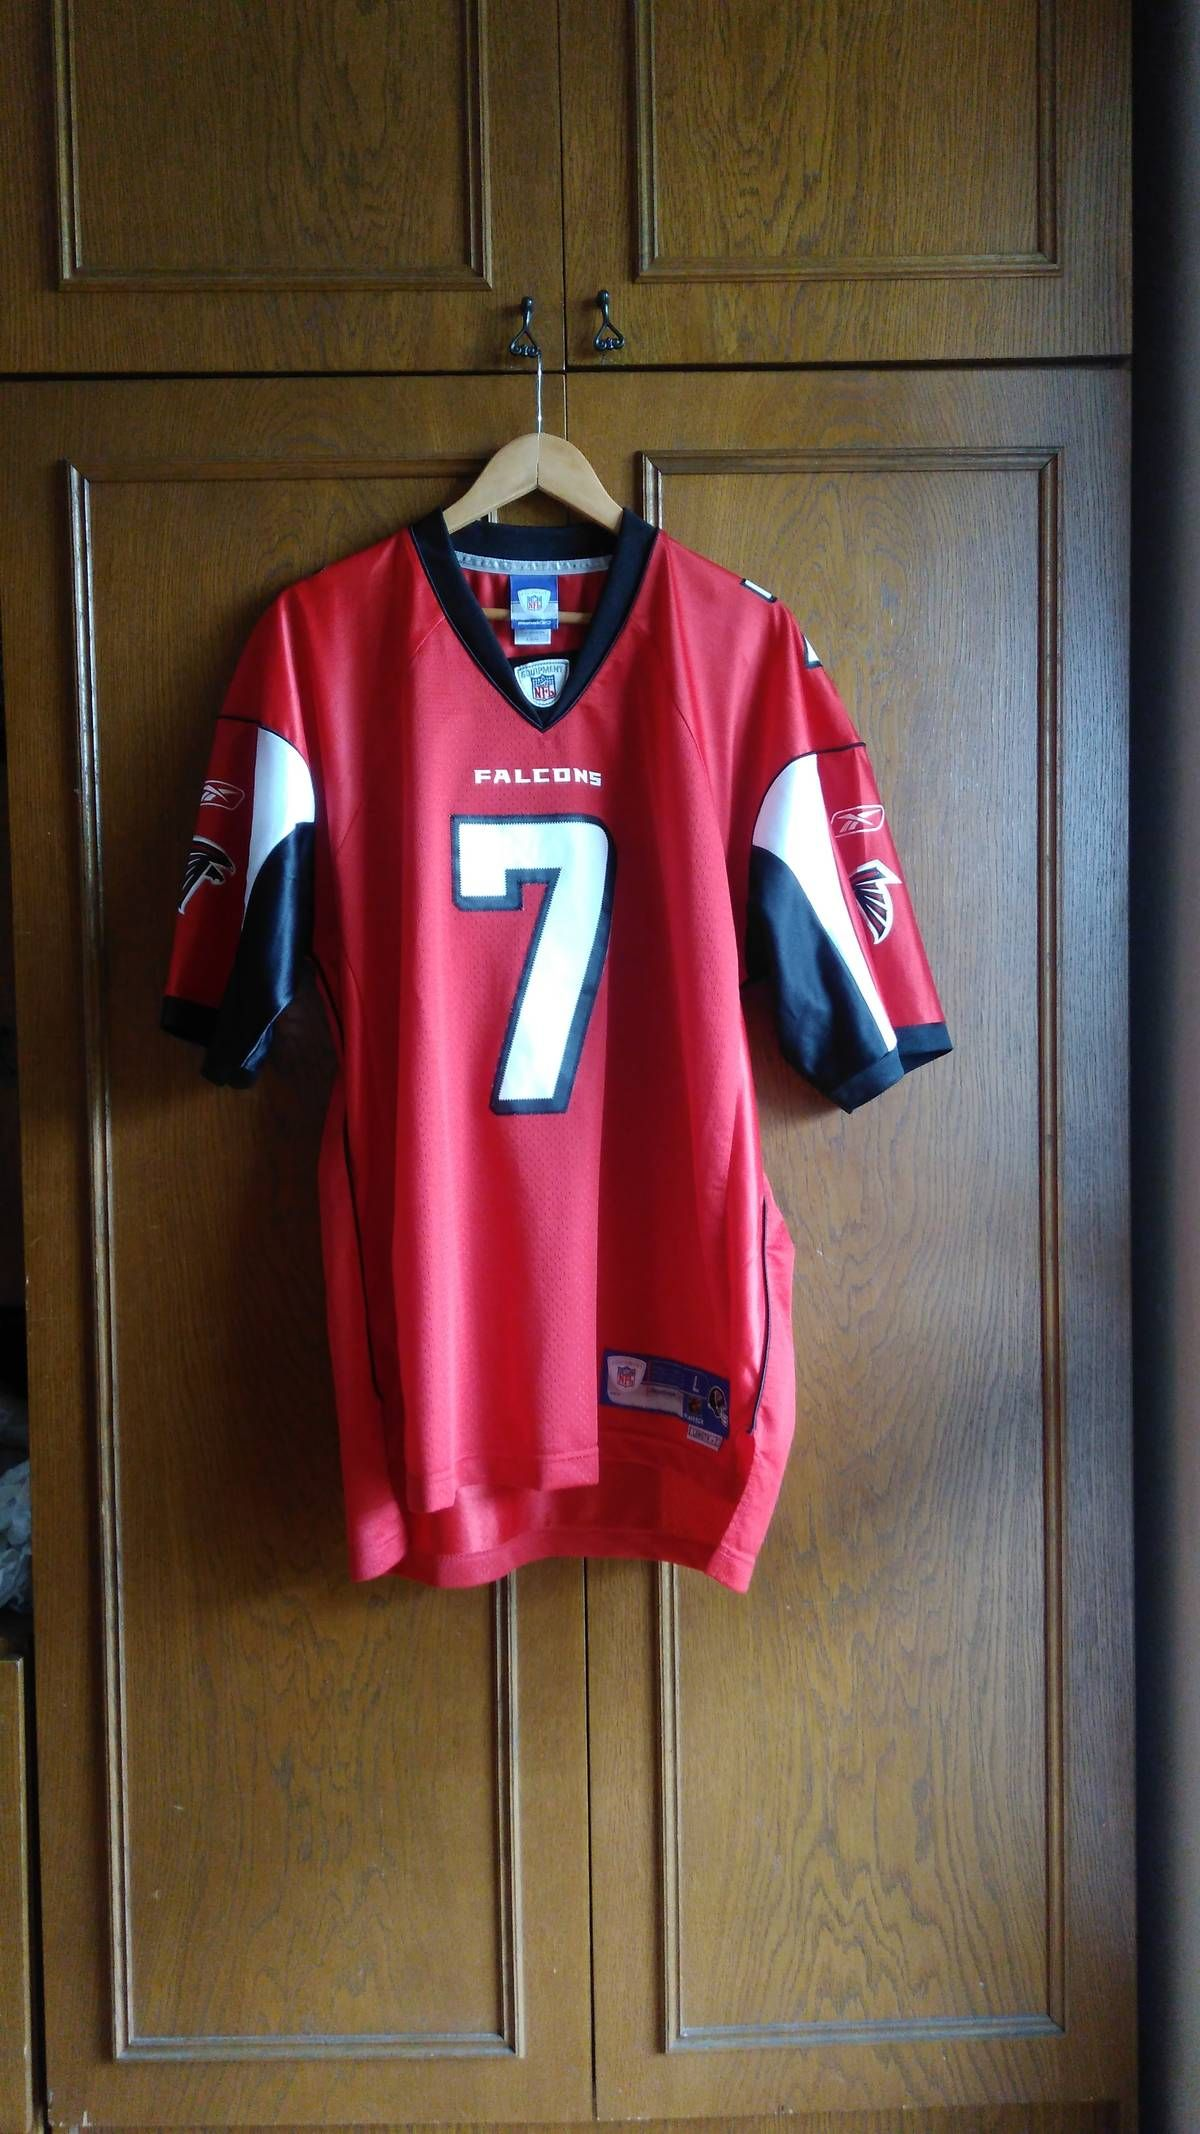 Nfl Reebok Sportswear Nfl Michael Vick Atlanta Falcons Jersey Number 7 Jersey Throwback Atlanta Falcons Mike Vick Jersey Football Sport Red Top Size Large J Red Shirt Atlanta Falcons Jersey Reebok Clothes